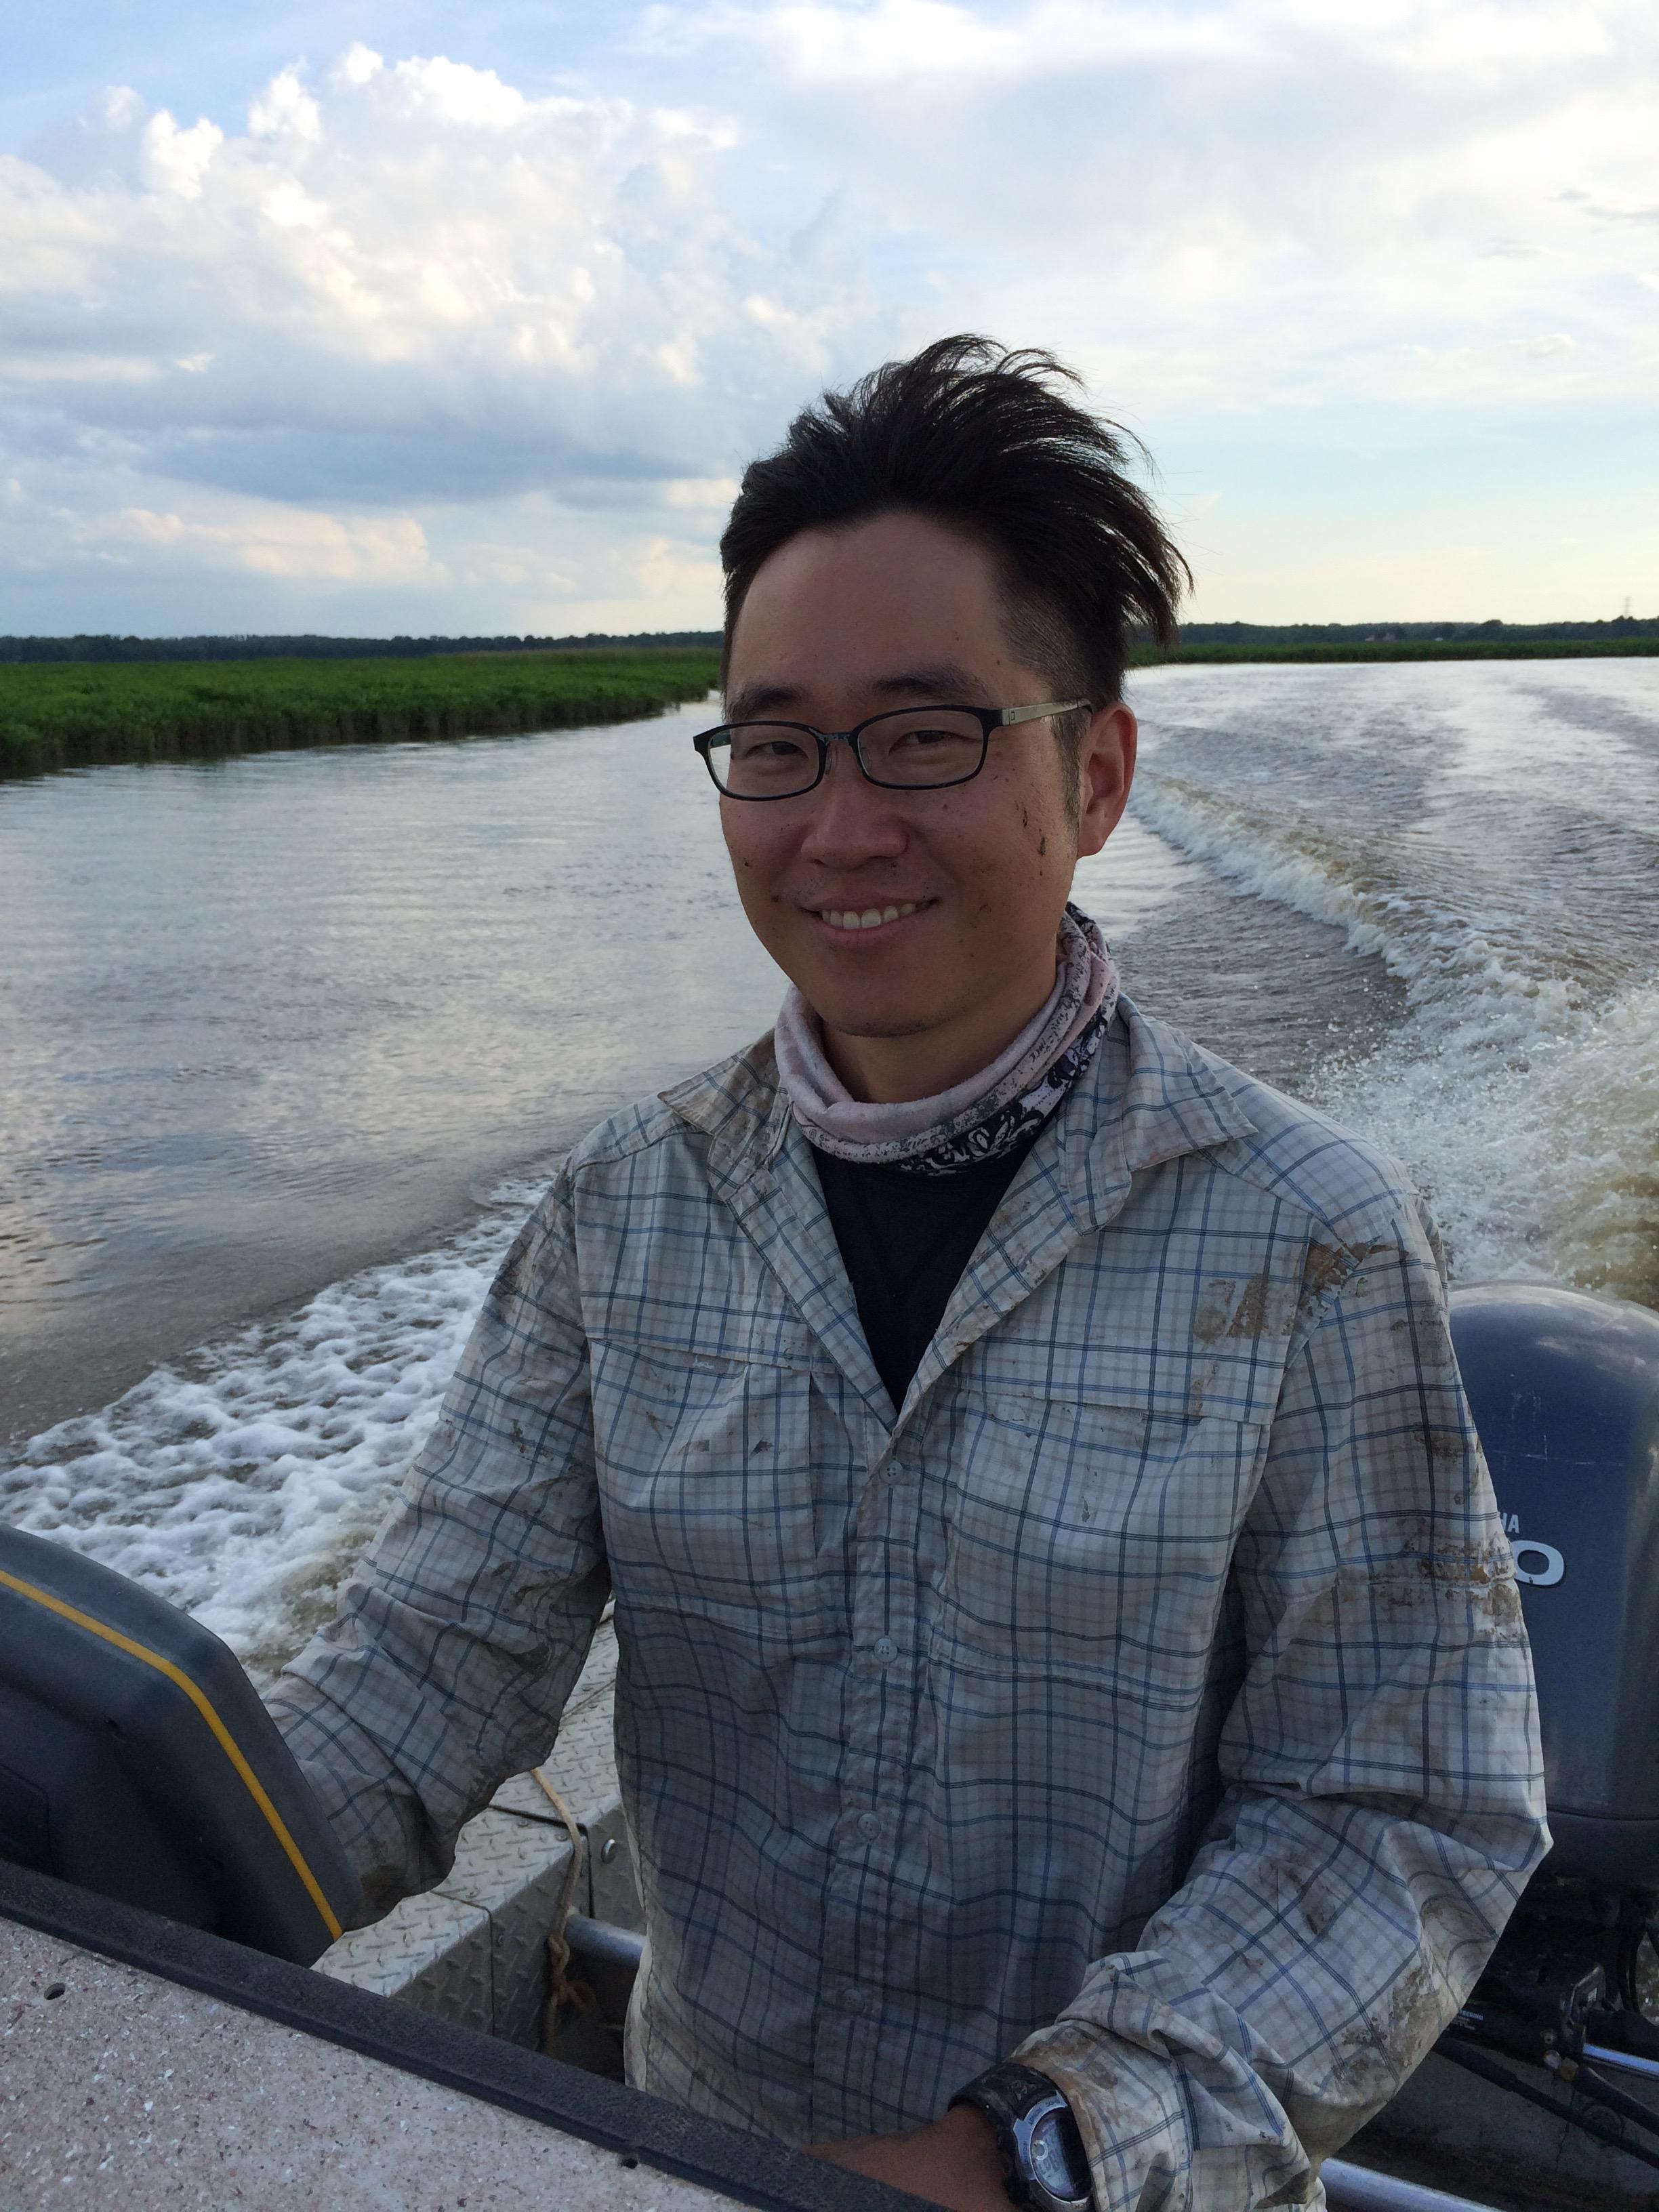 Cruising down the Pamunkey River.